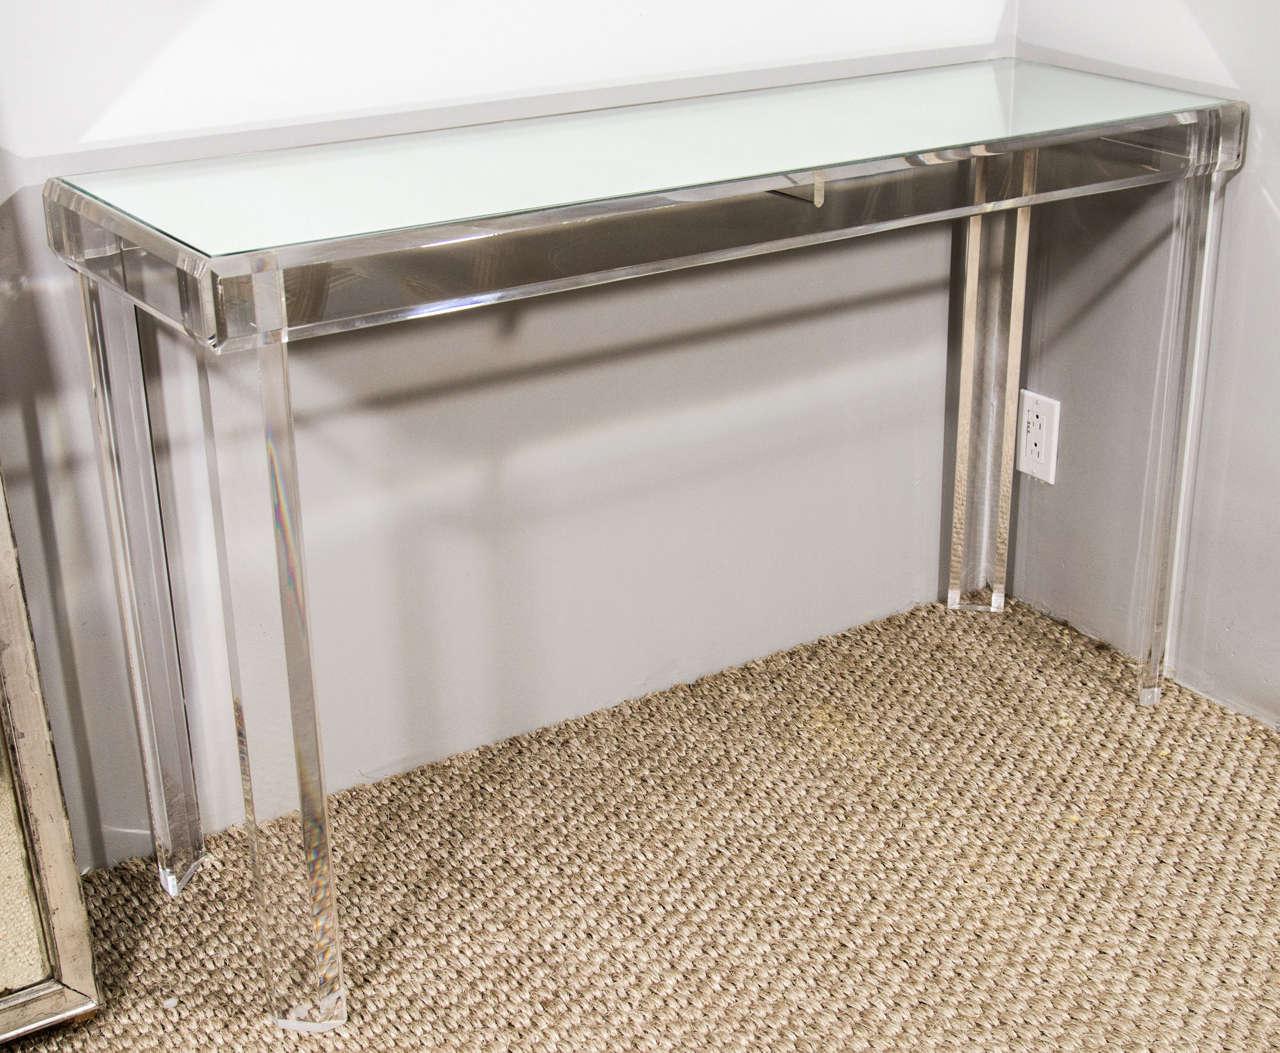 Phenomenal Lucite Console Table At 1Stdibs Spiritservingveterans Wood Chair Design Ideas Spiritservingveteransorg